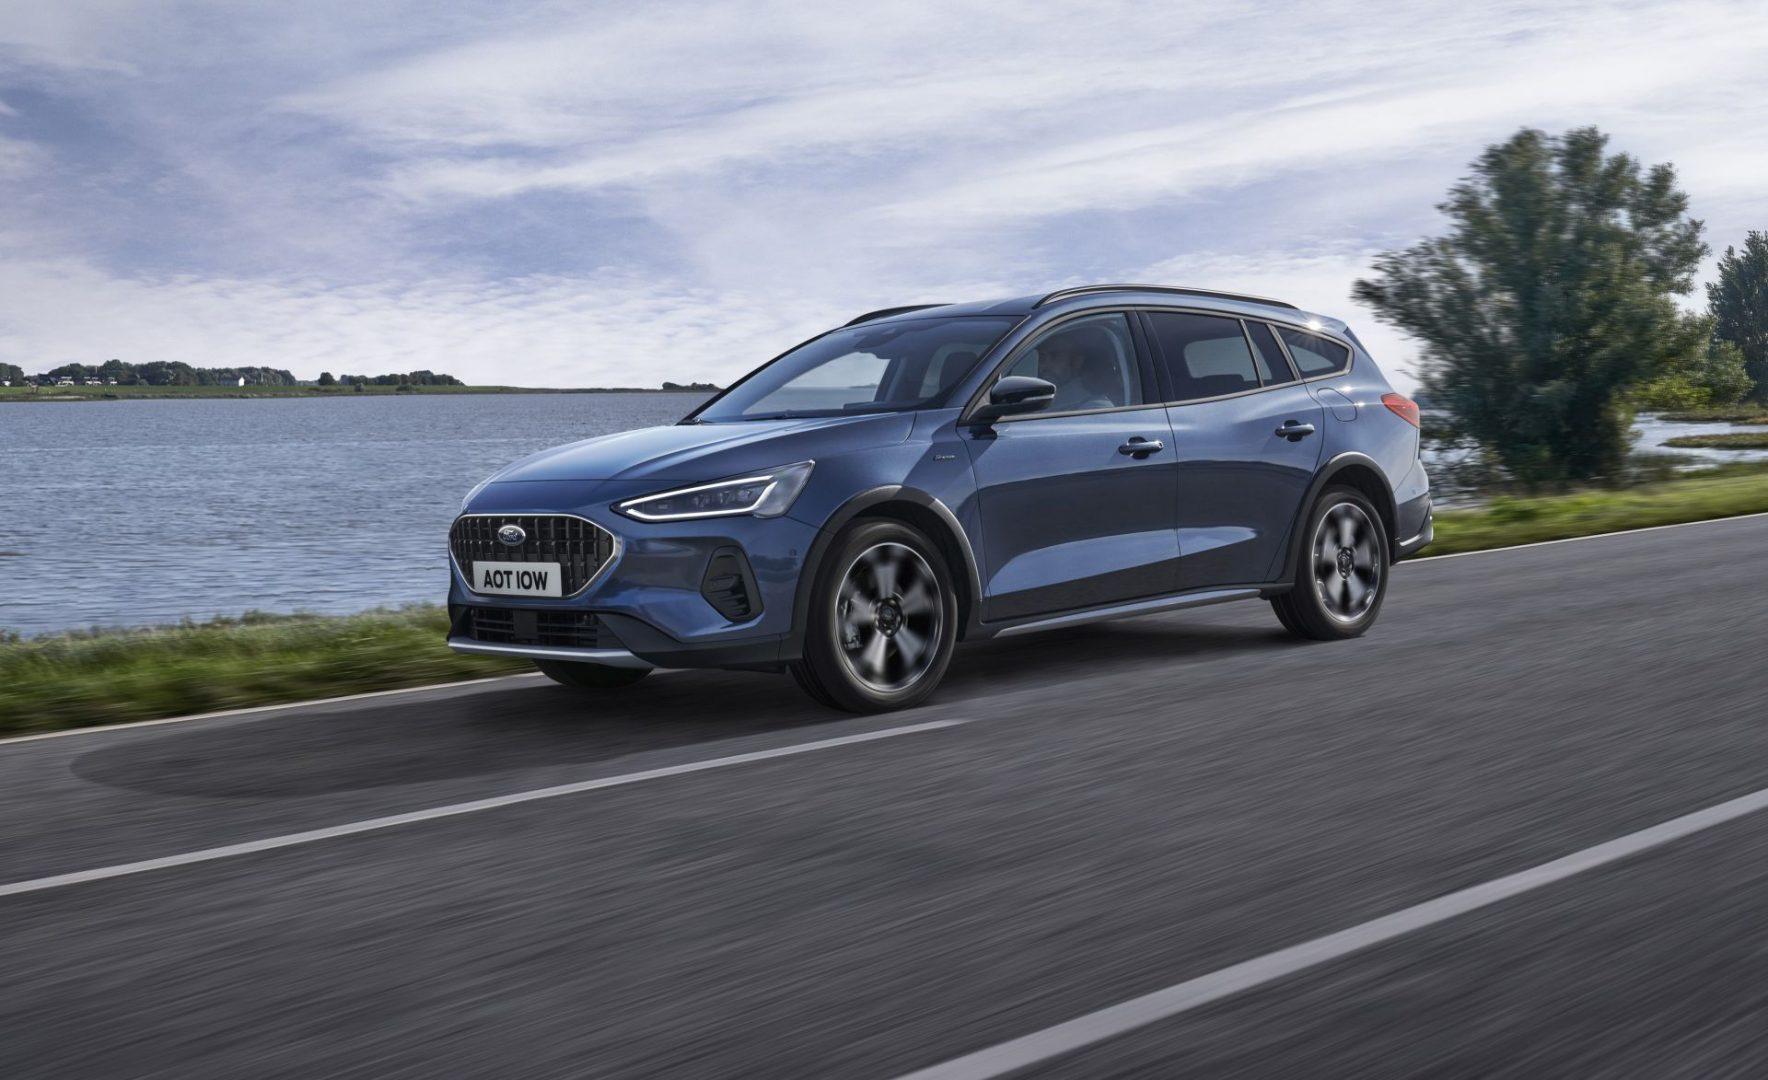 Redizajn i za Ford Focus: novi dizajn prednjeg dijela i novi multimedijski sustav